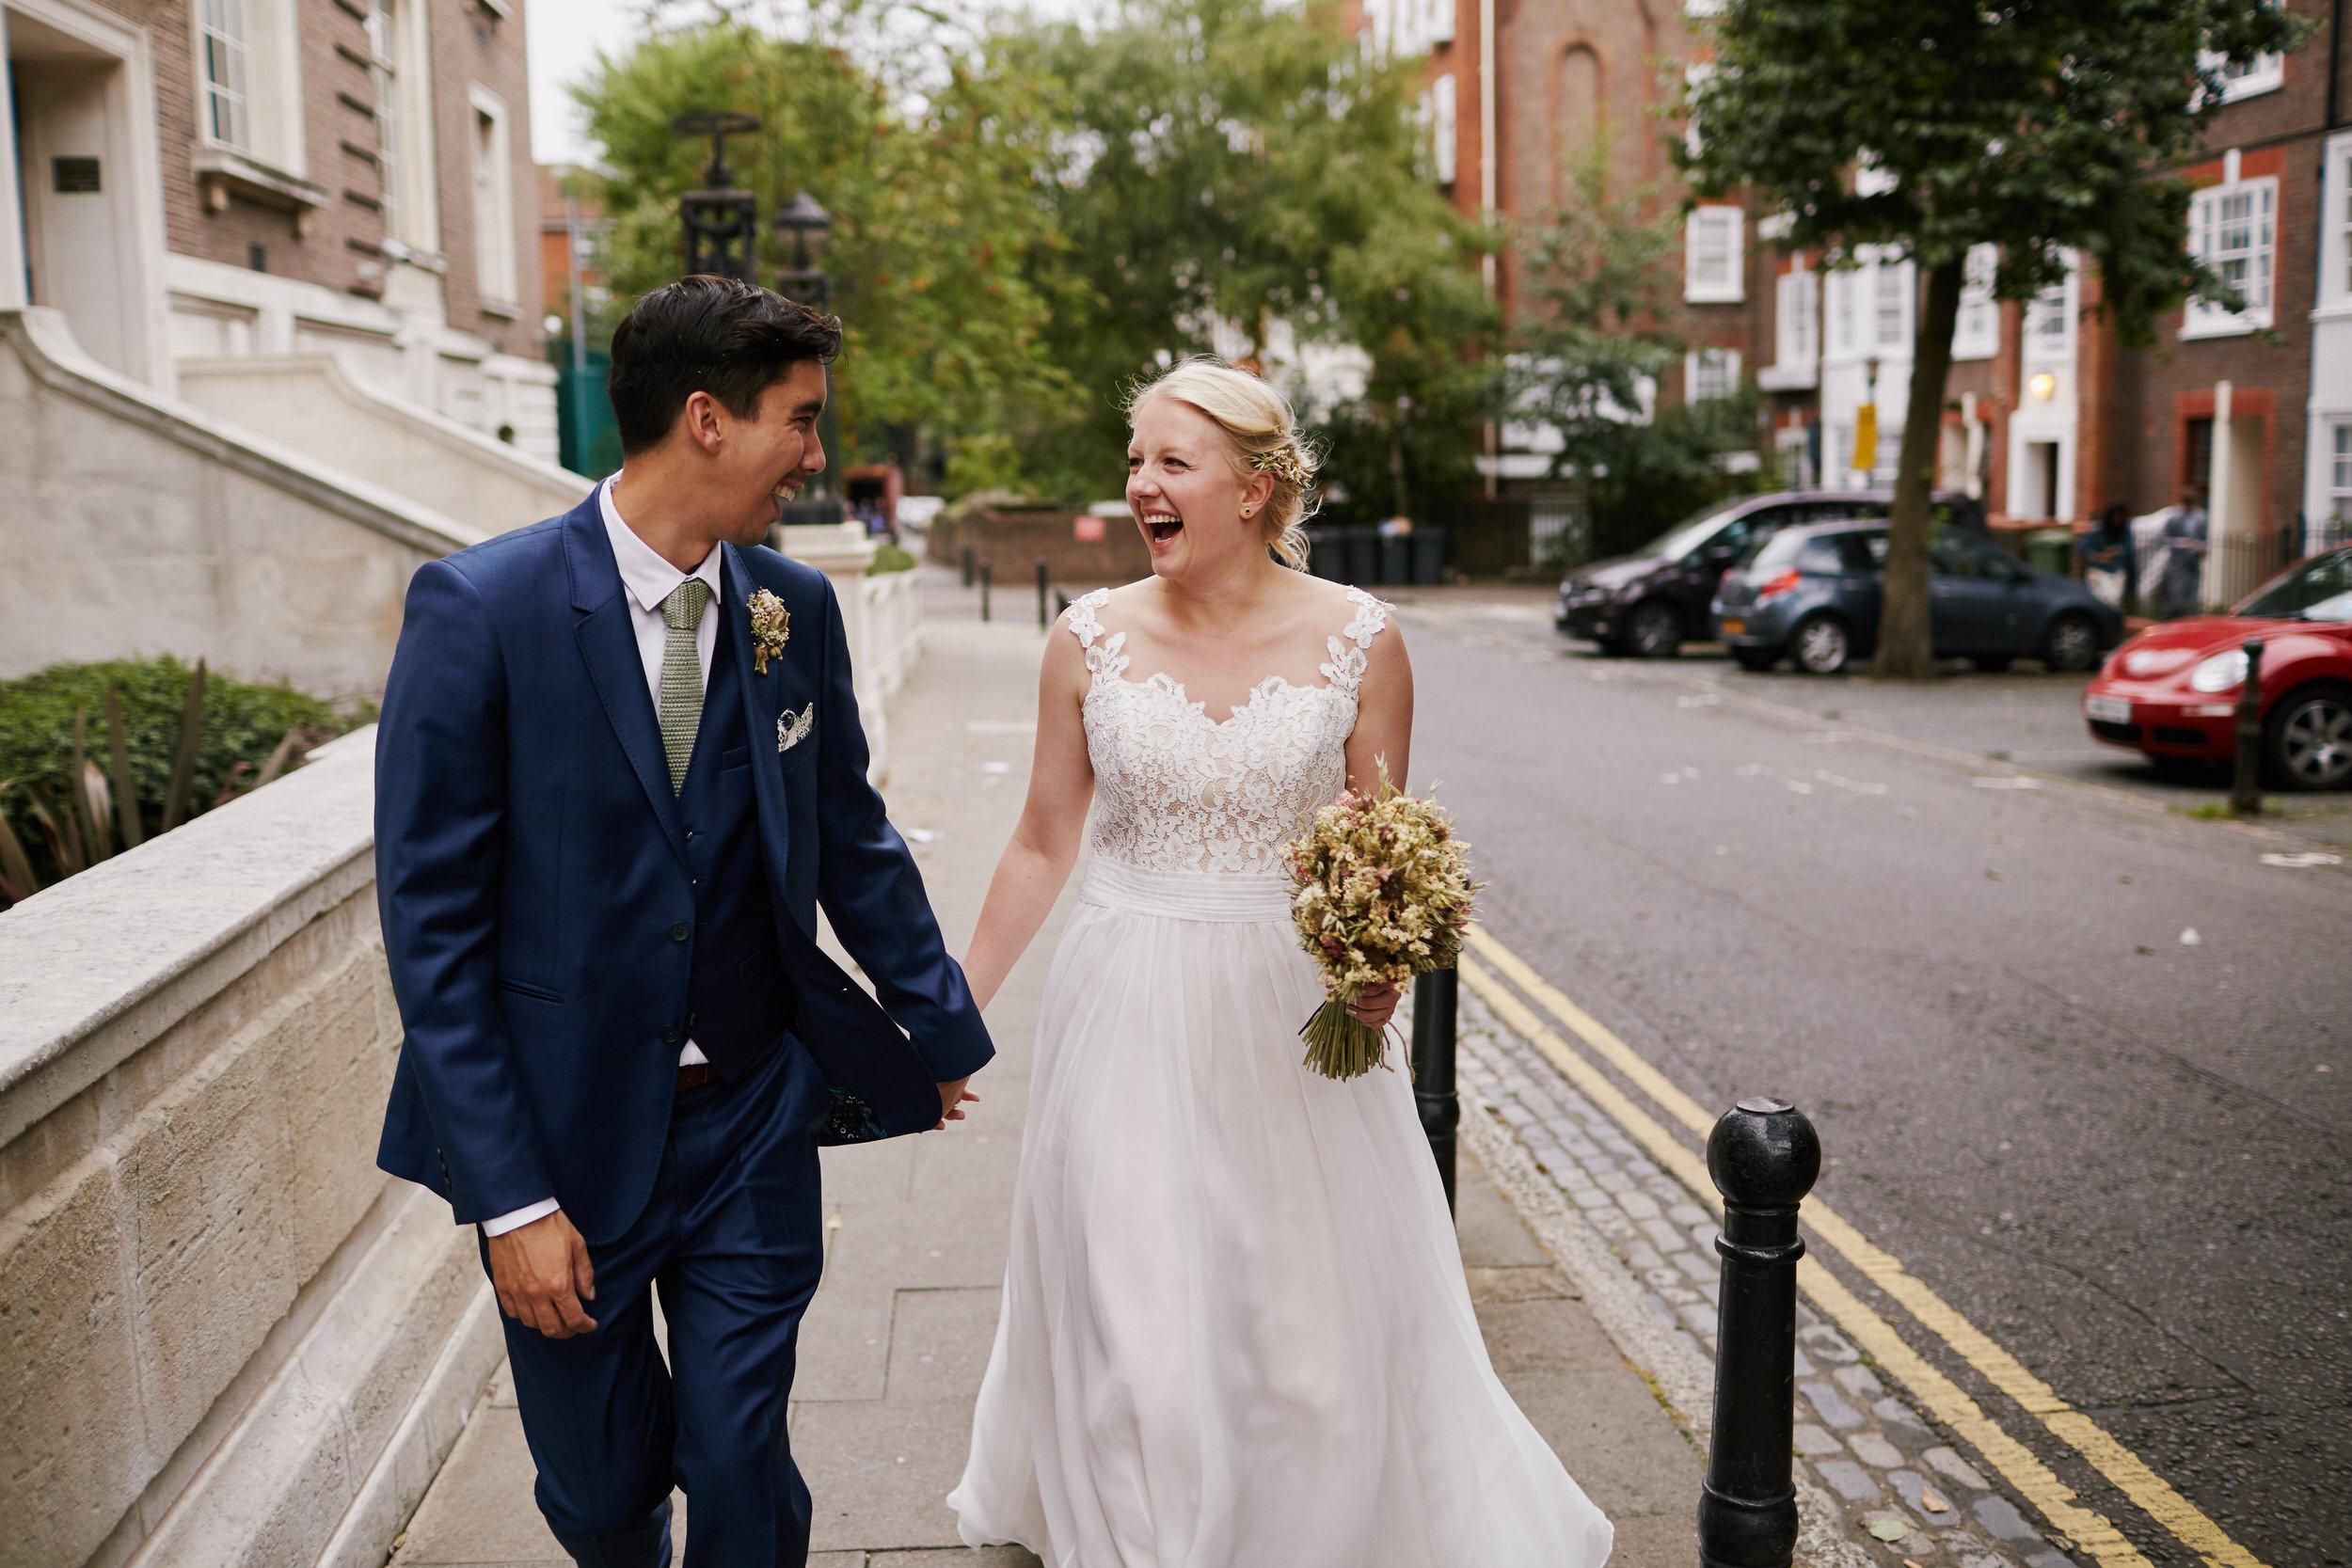 Wedding in London - Echoes & Wild Hearts 0022.jpg